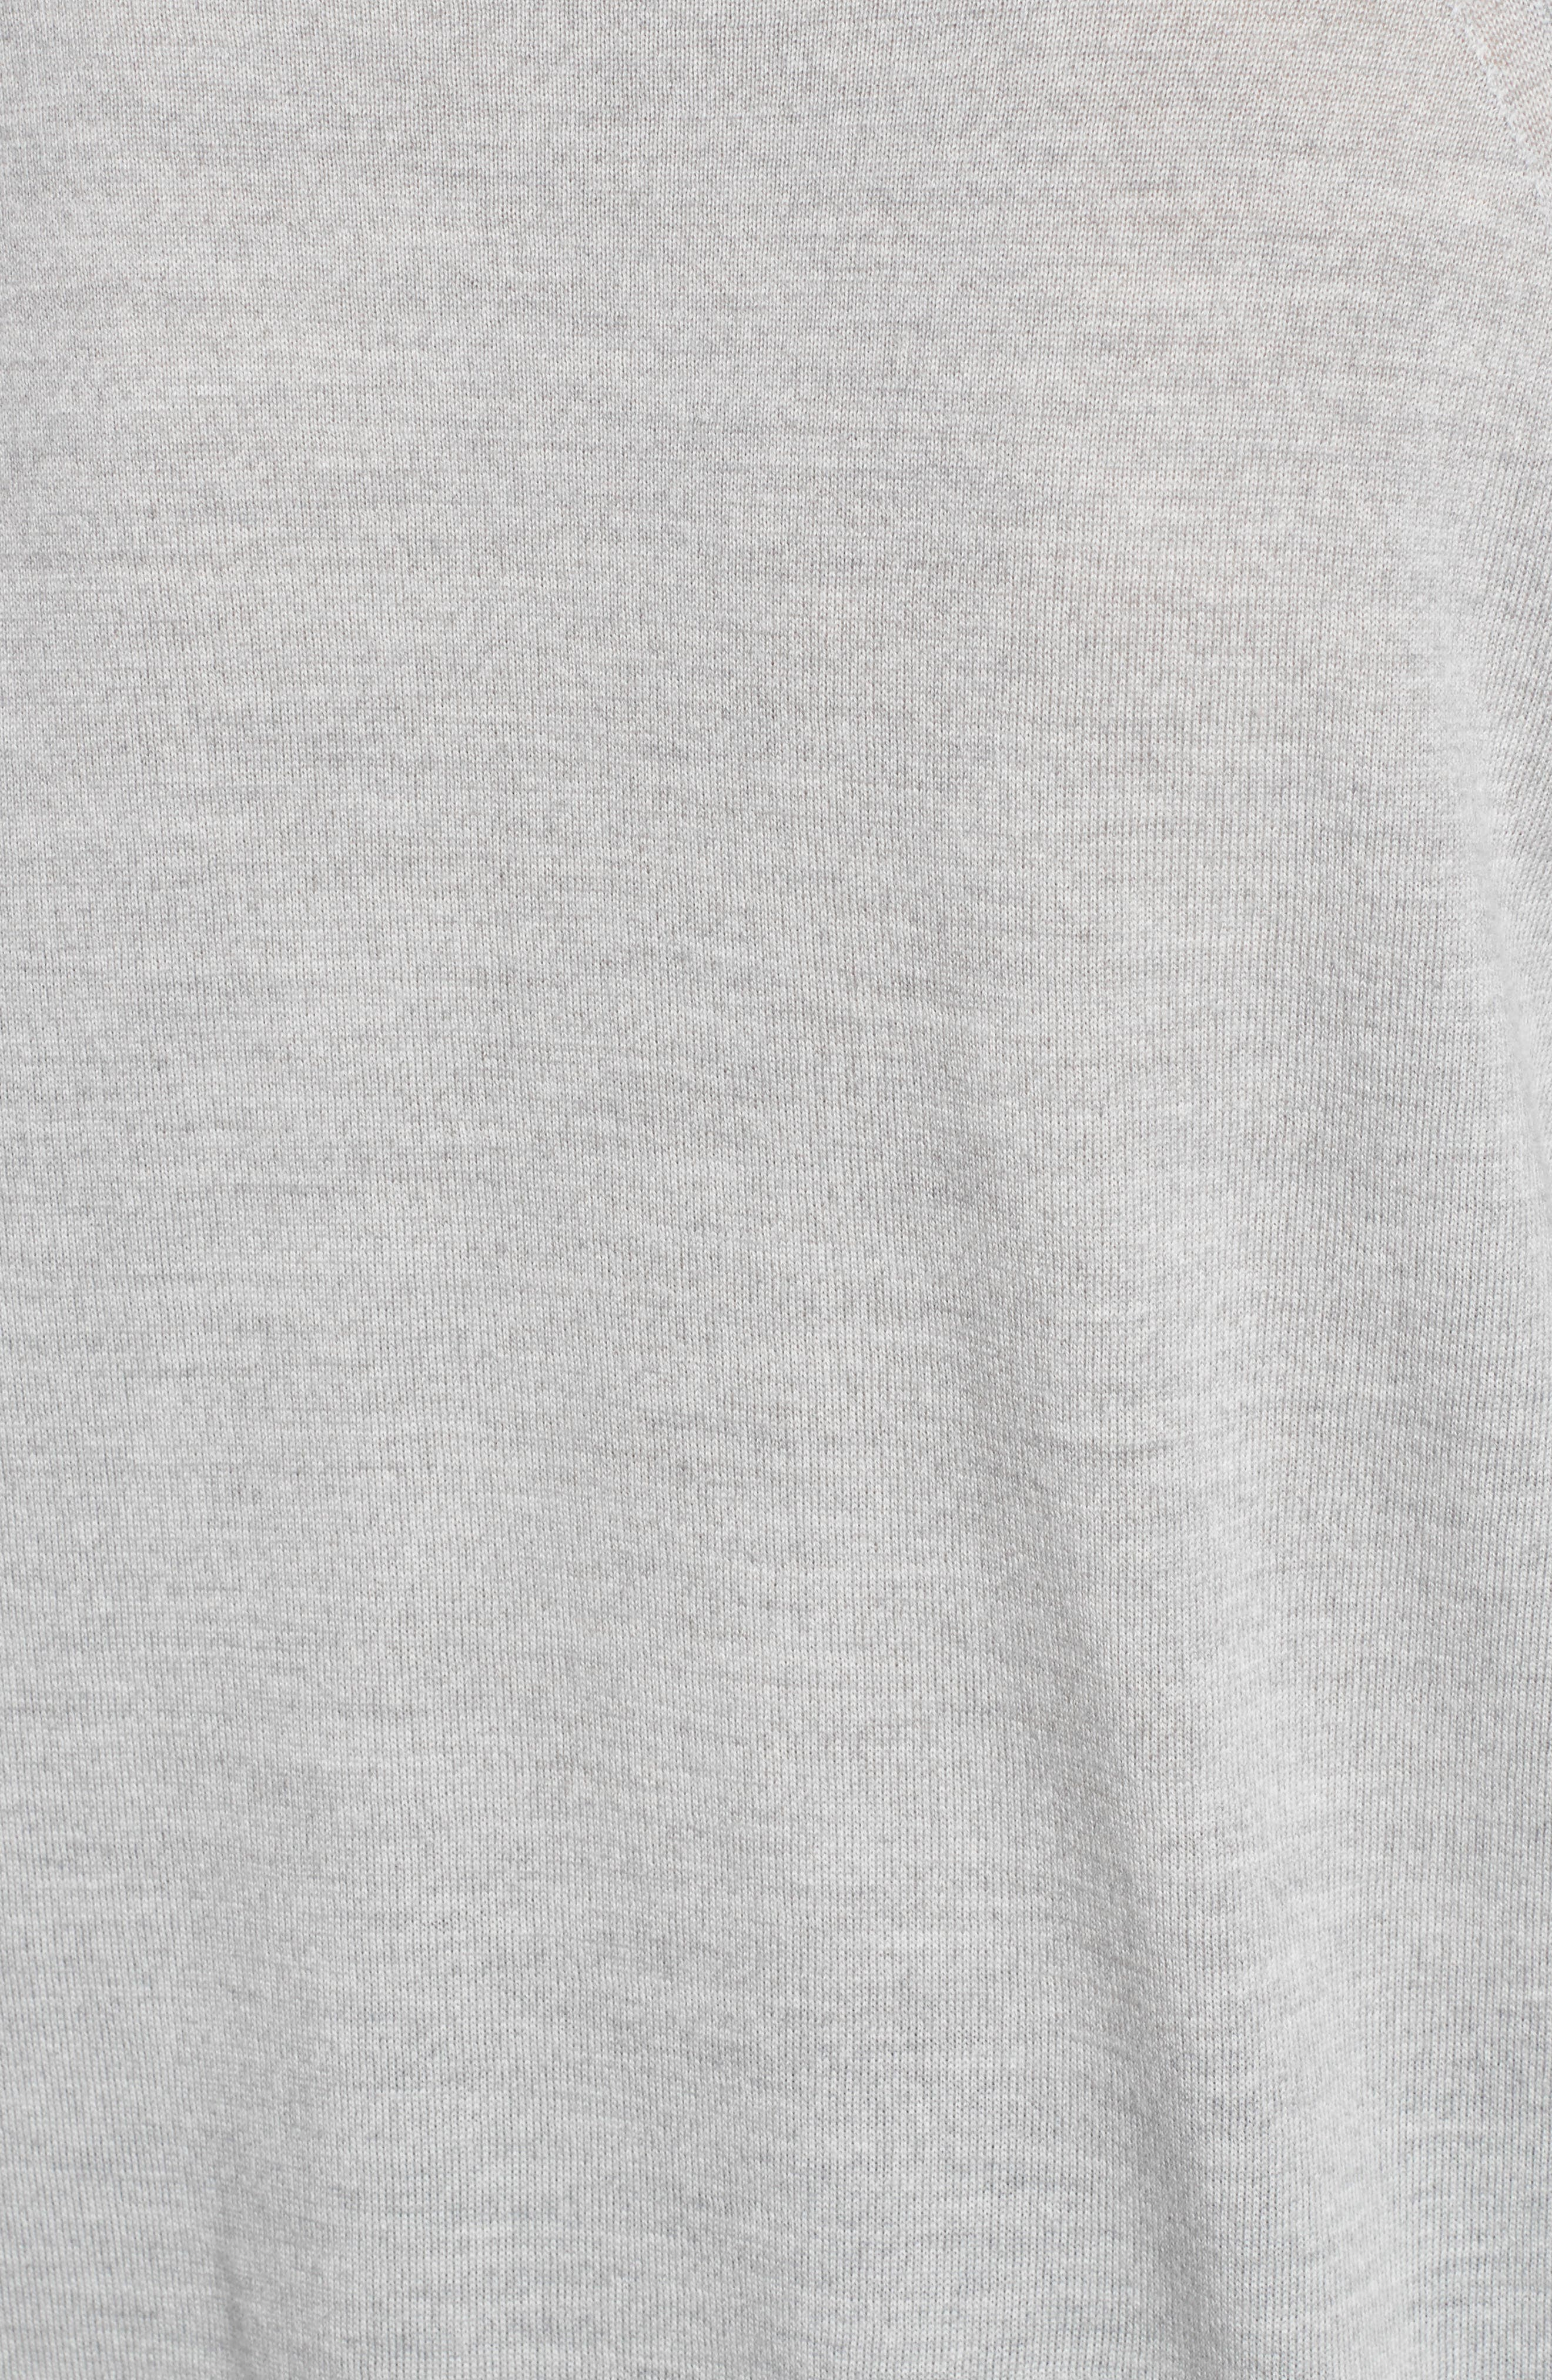 Rime Bis Merino Wool Sweater,                             Alternate thumbnail 5, color,                             078